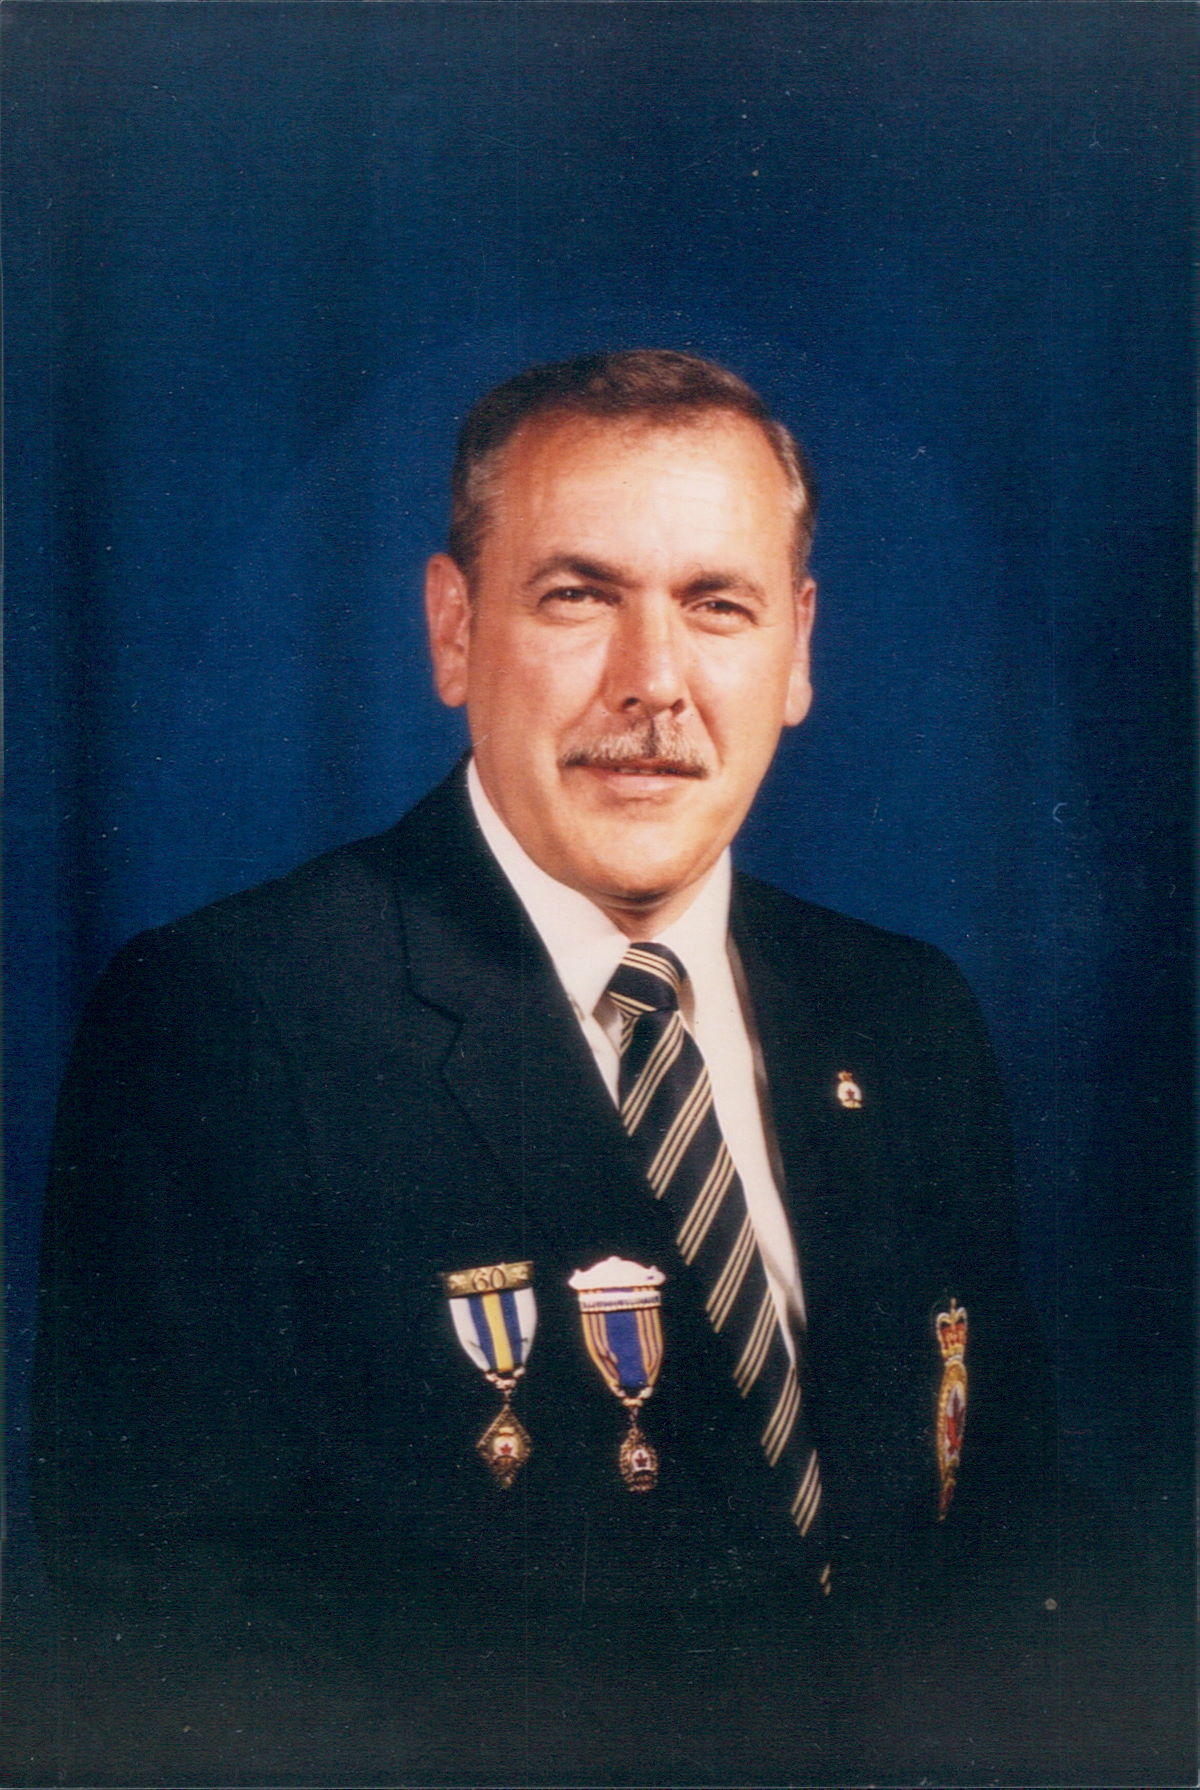 Richard Gallant